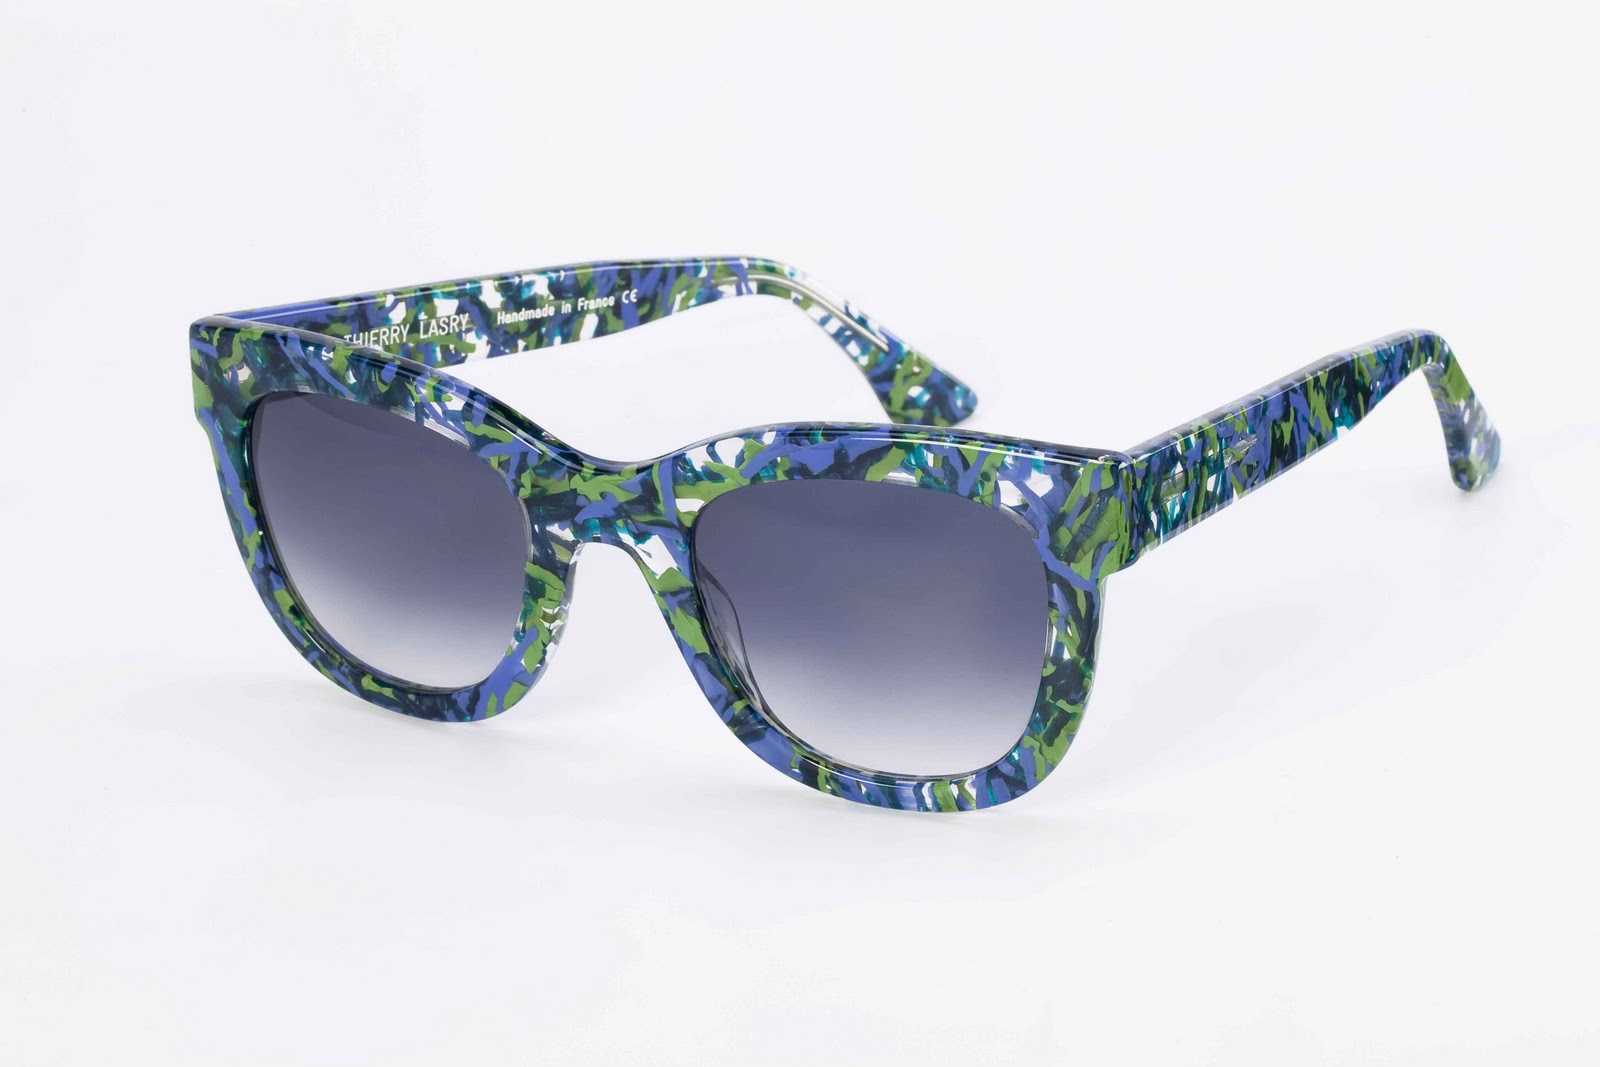 http://3.bp.blogspot.com/-QEVdRdqtlTE/TukecAJXqoI/AAAAAAAAAXE/S7St3BRxgwk/s1600/Eva+Mendes+et+Ryan+Gosling%252C+les+lunettes+3.jpg